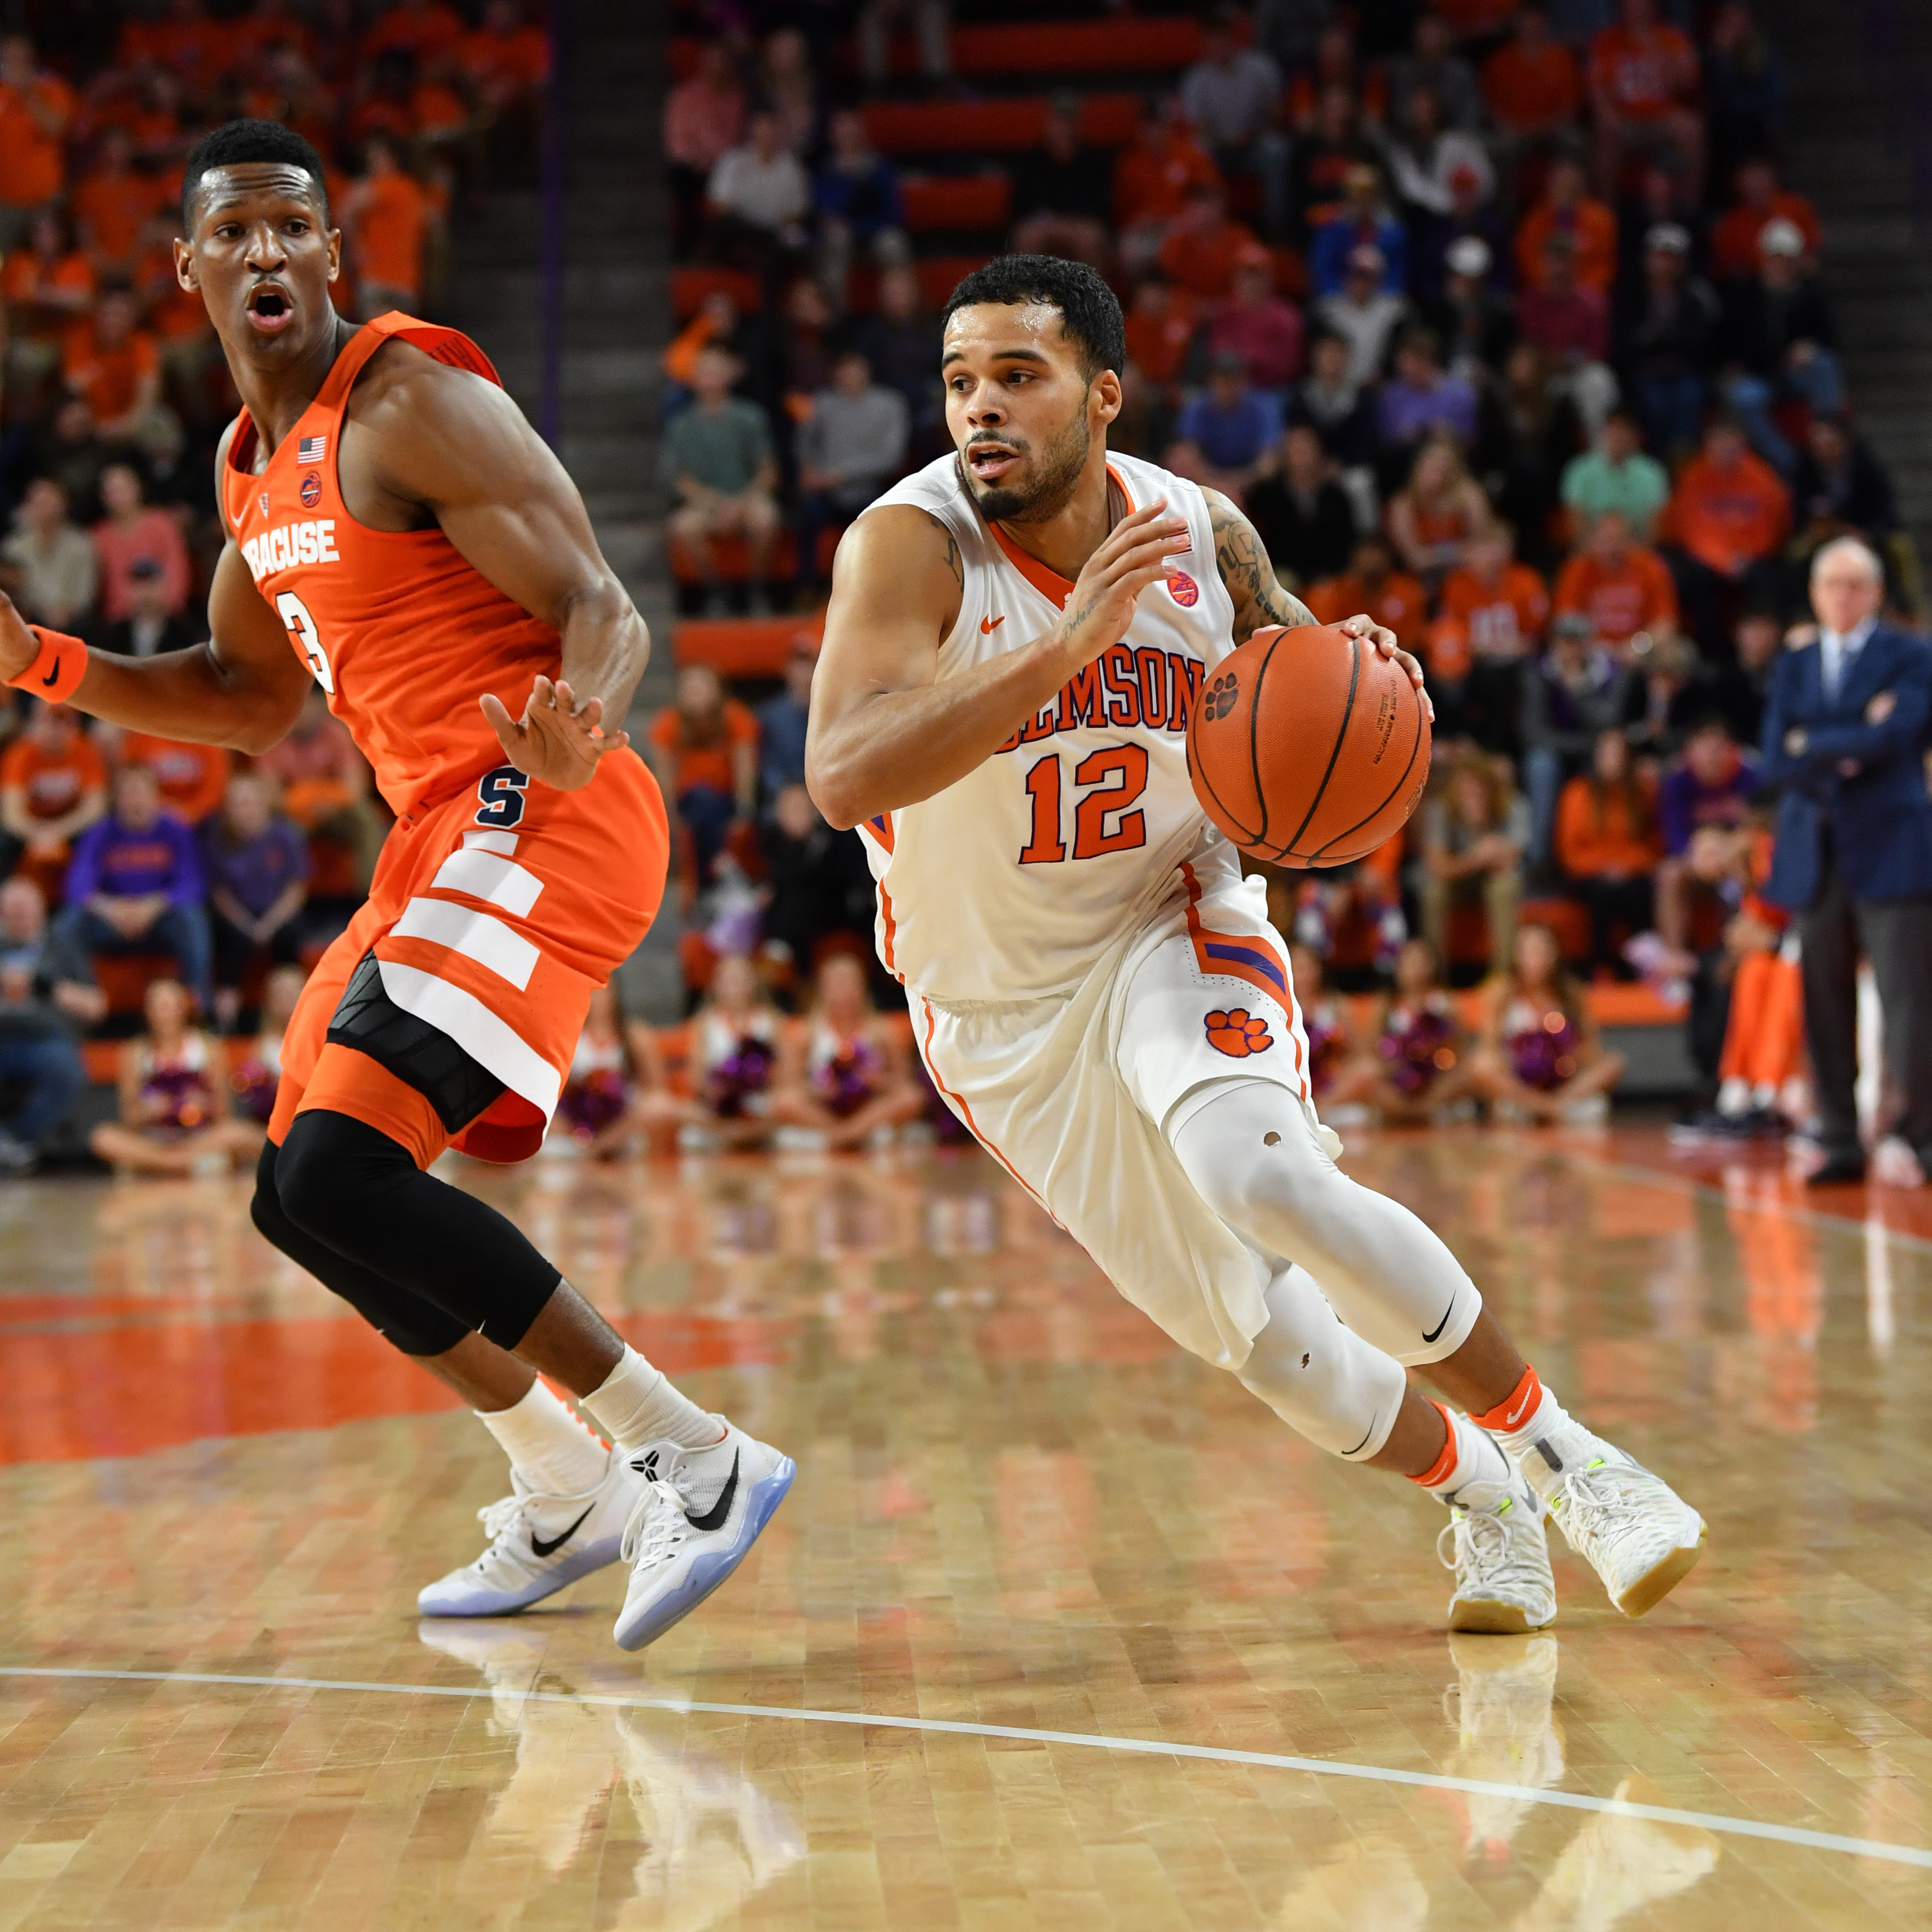 Tigers Fall to Syracuse, 82-81